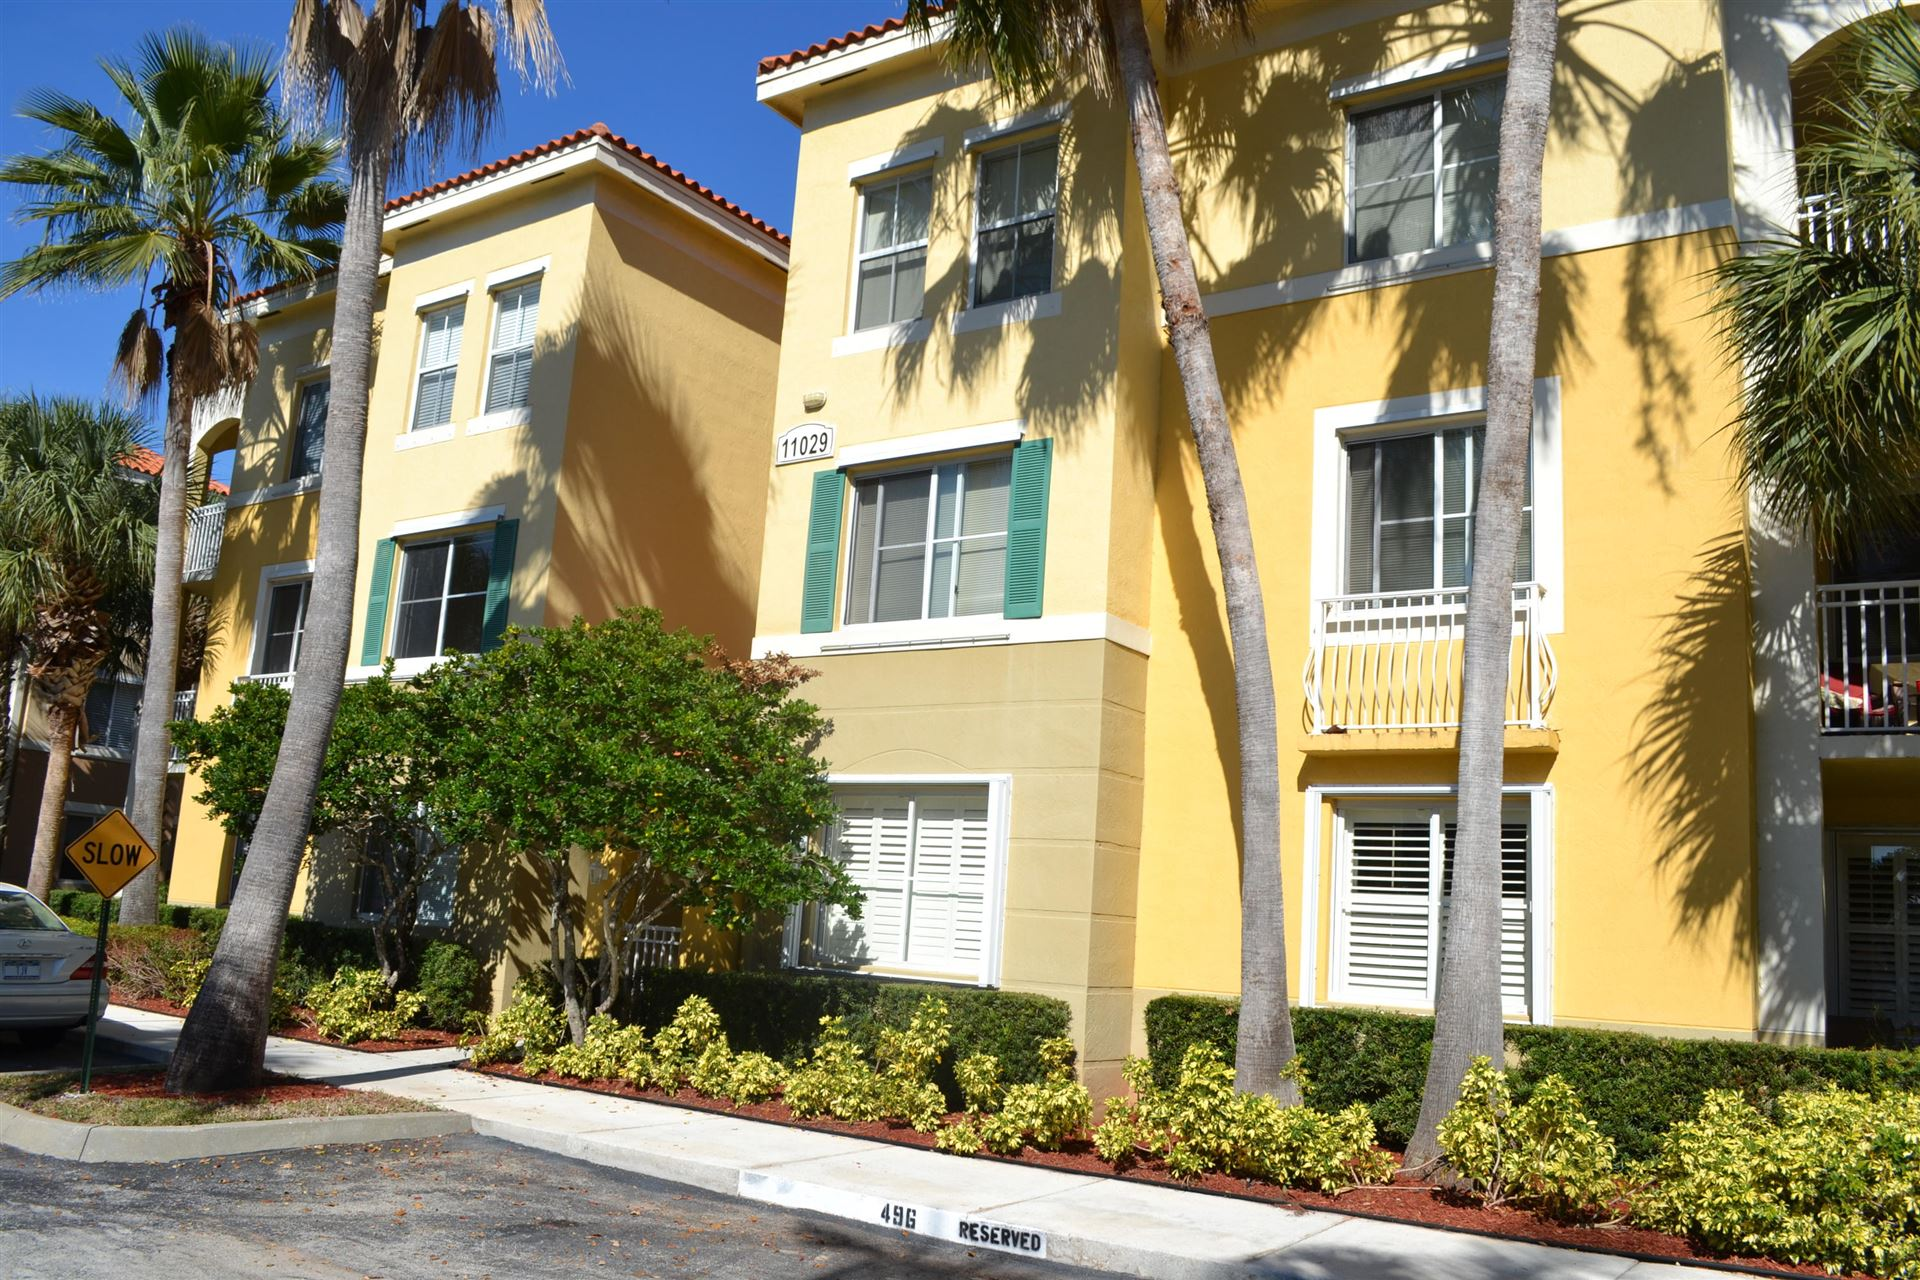 Photo of 11029 Legacy Boulevard #204, Palm Beach Gardens, FL 33410 (MLS # RX-10686270)